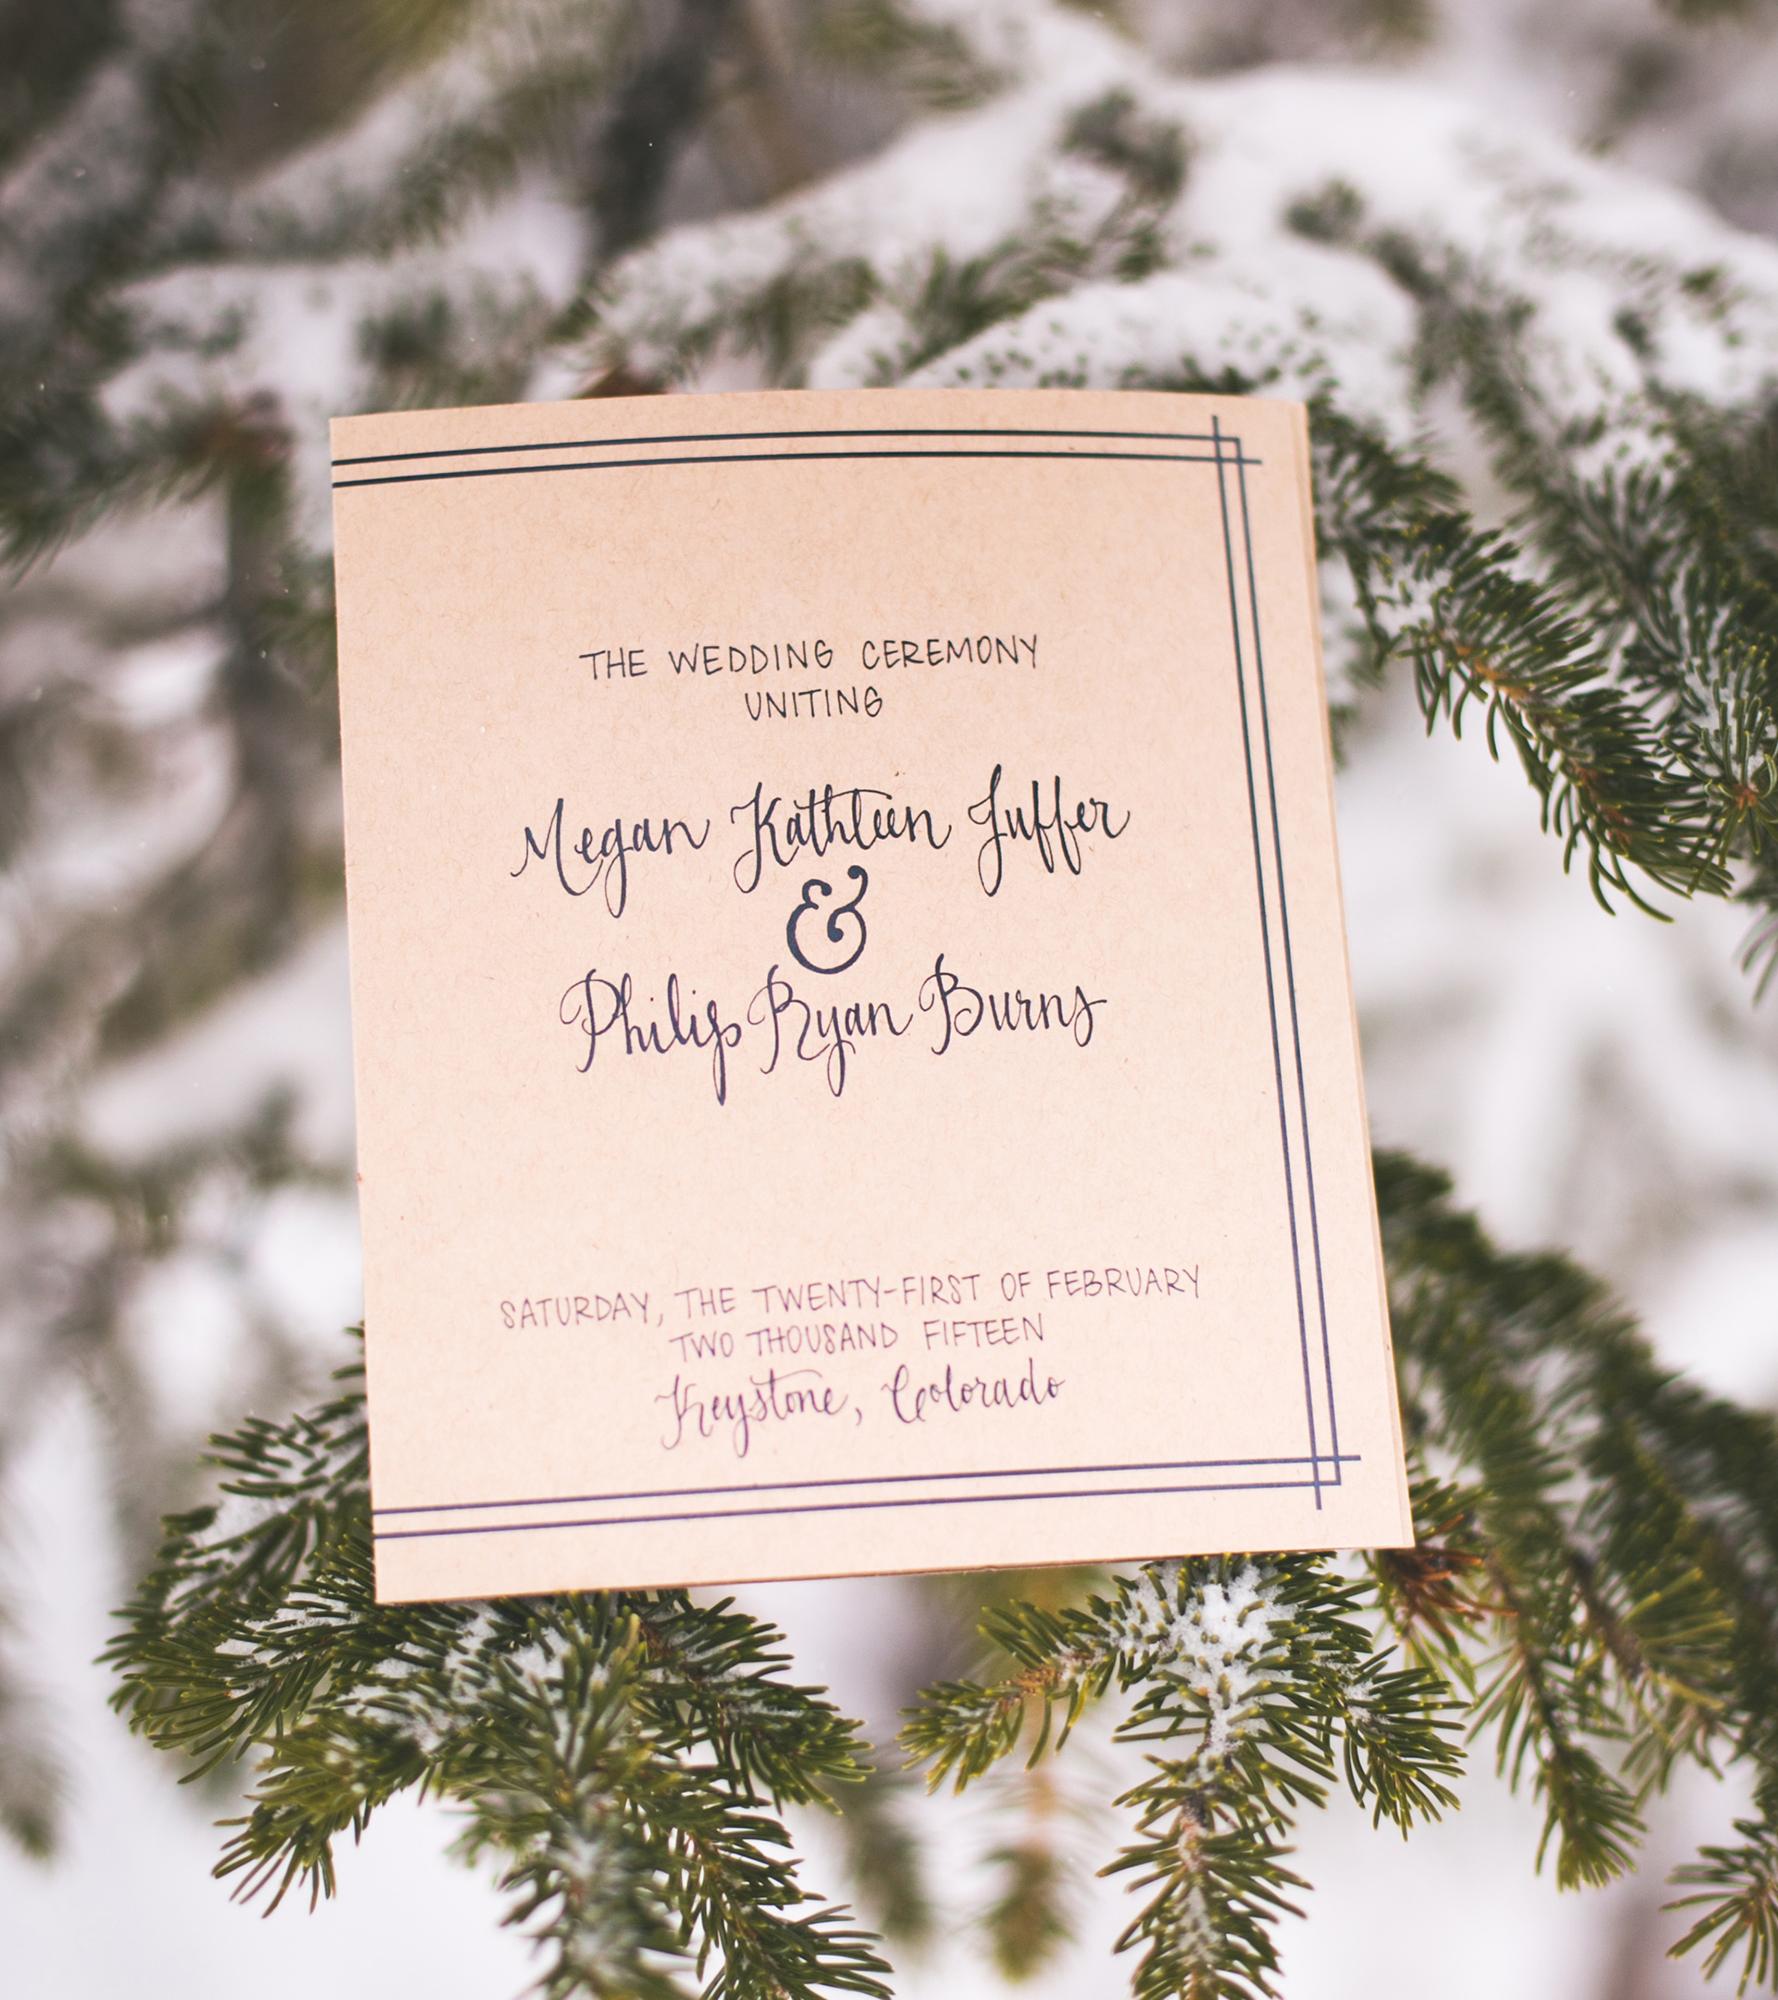 Megan & Phil Wedding_Program_web.jpg